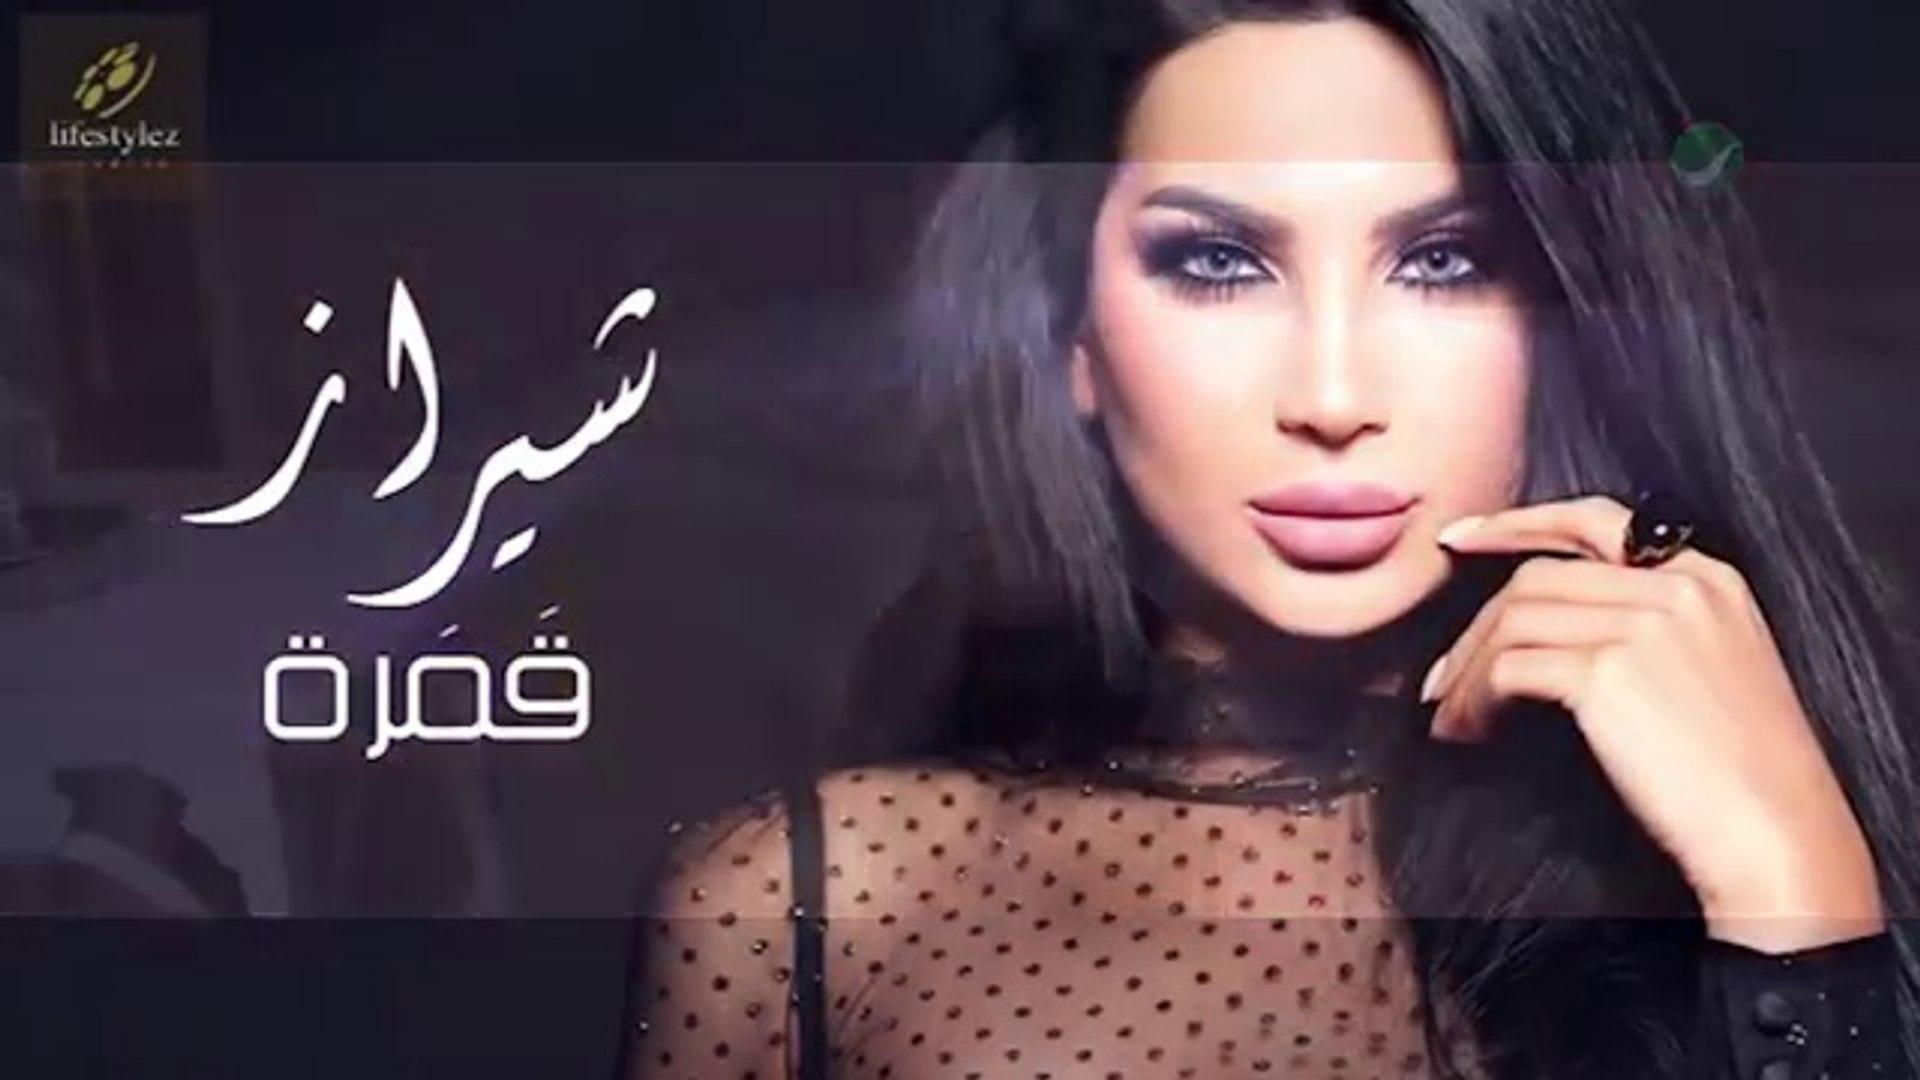 Top 10 Arabic songs 2016  أفضل 10 اغاني عربية